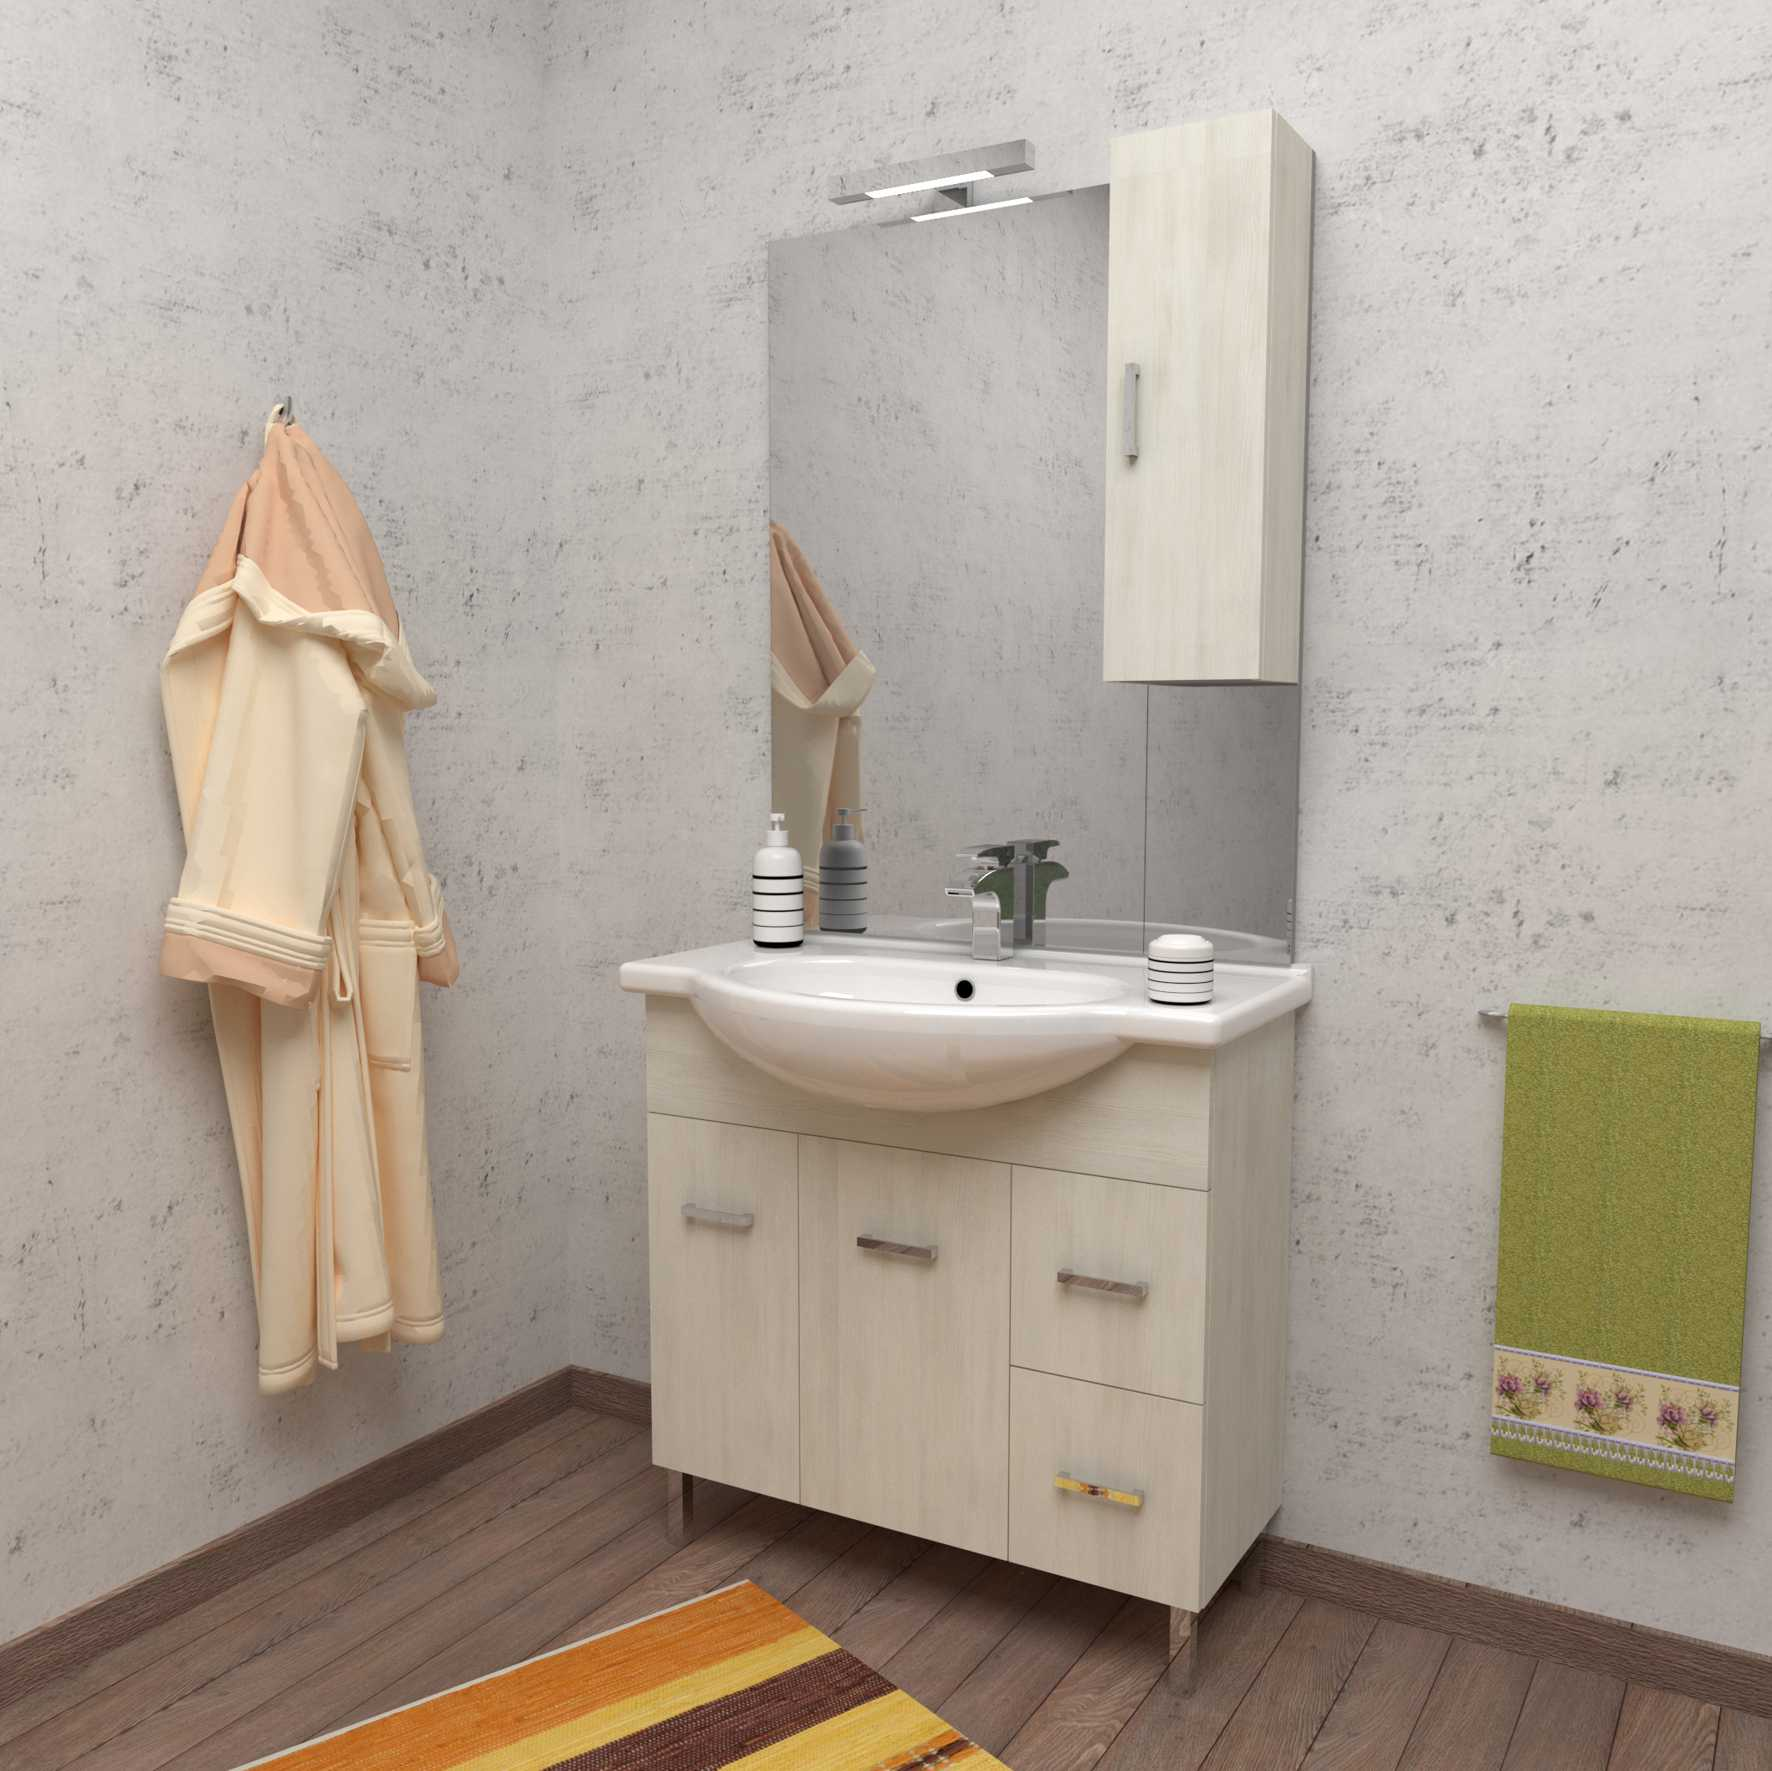 Mobile bagno a terra PALMA 85 cm 85x50 bianco larice con lavabo in ceramica